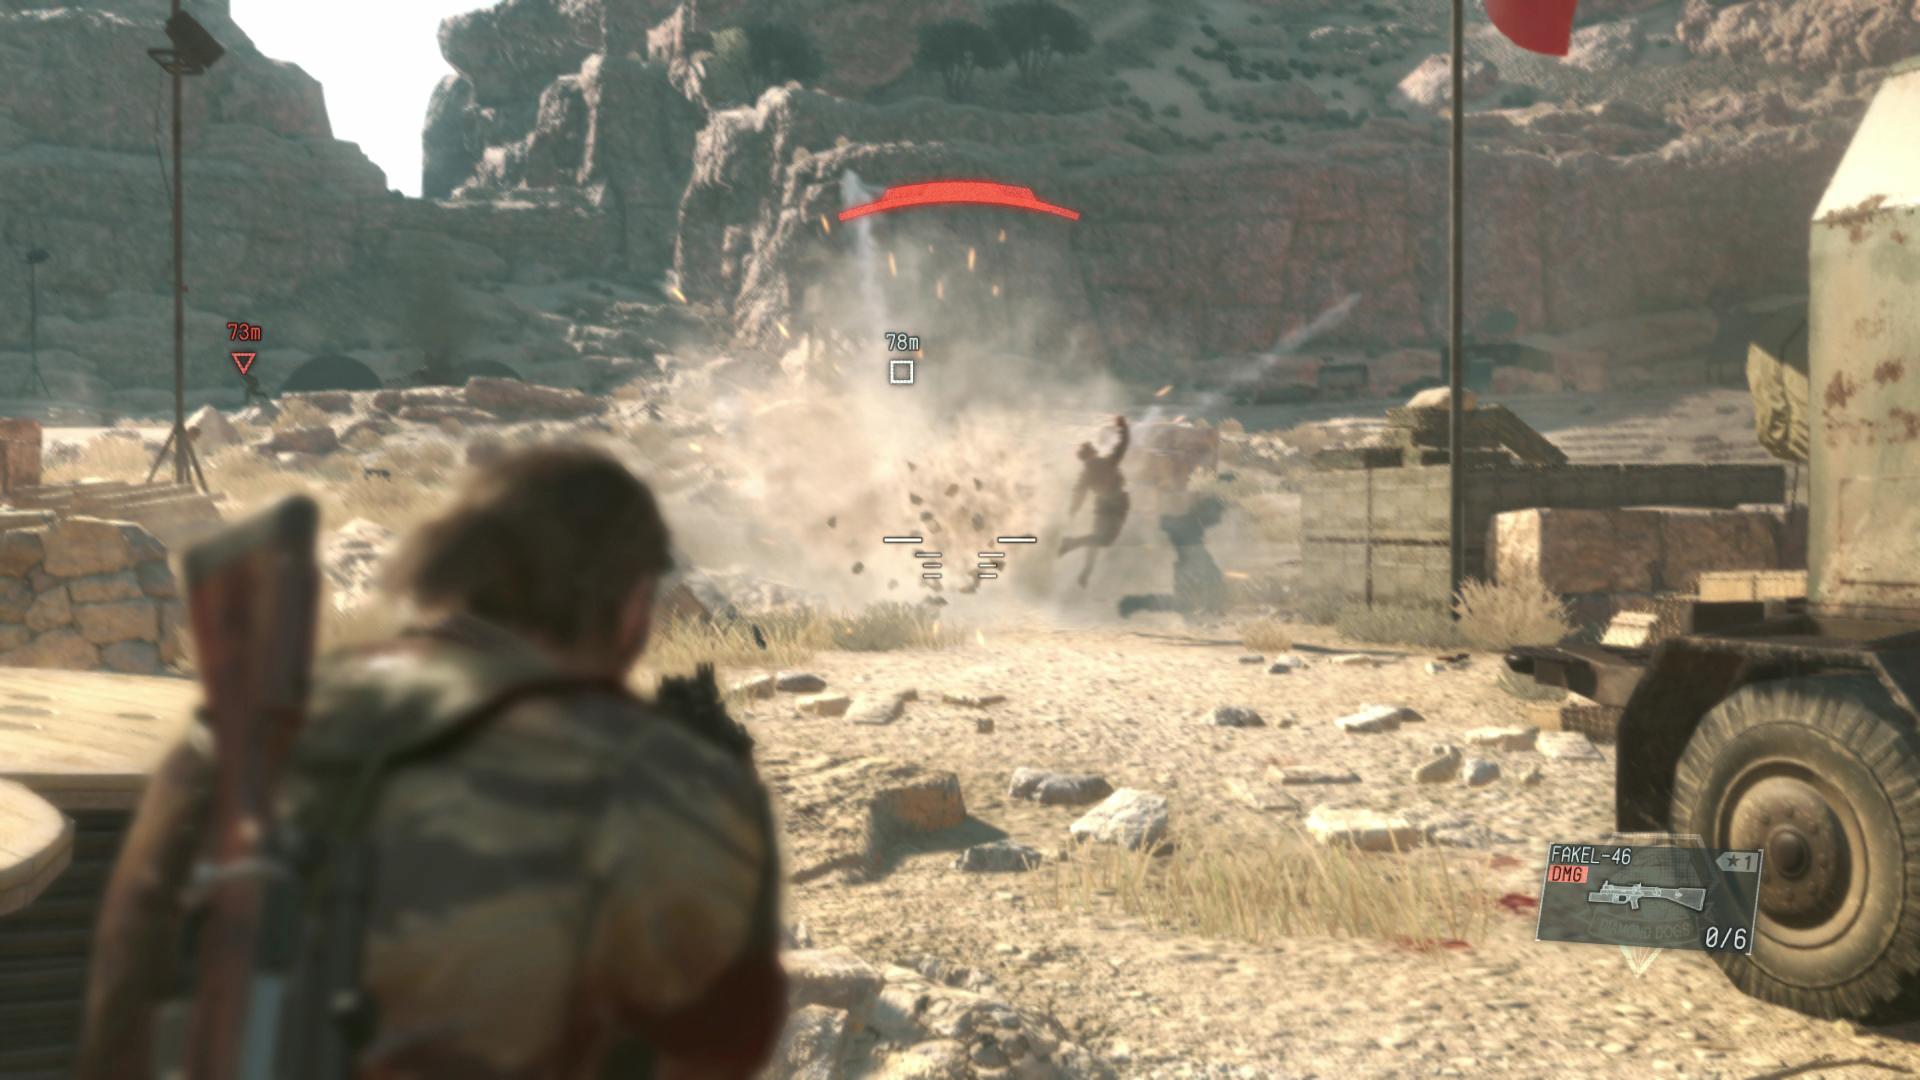 Metal Gear Solid V: The Phantom Pain Screenshot 3